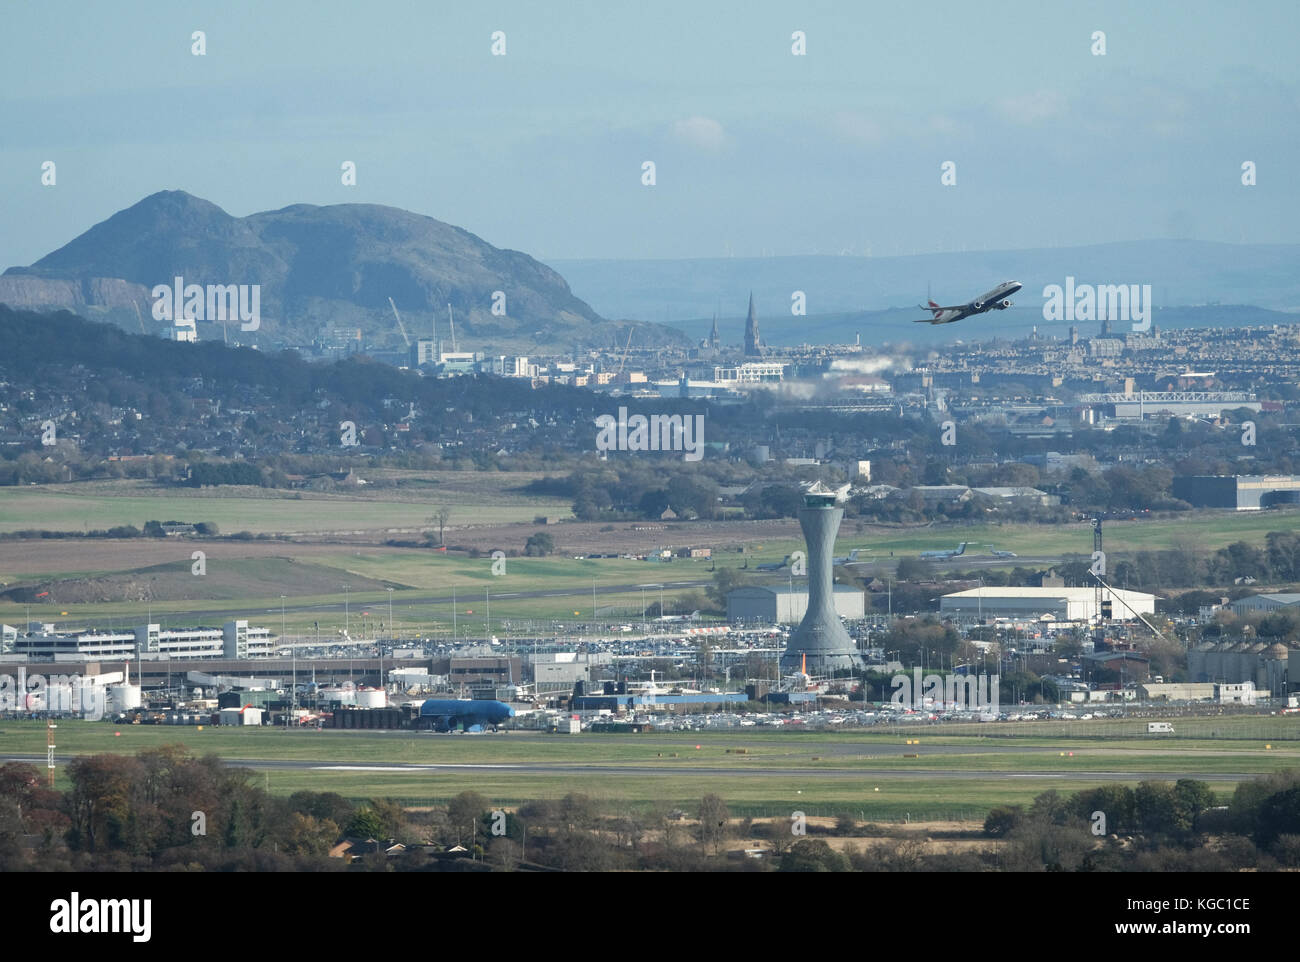 A British Airways aircraft takes off from Edinburgh Airport, Ingliston, Edinburgh. Stock Photo